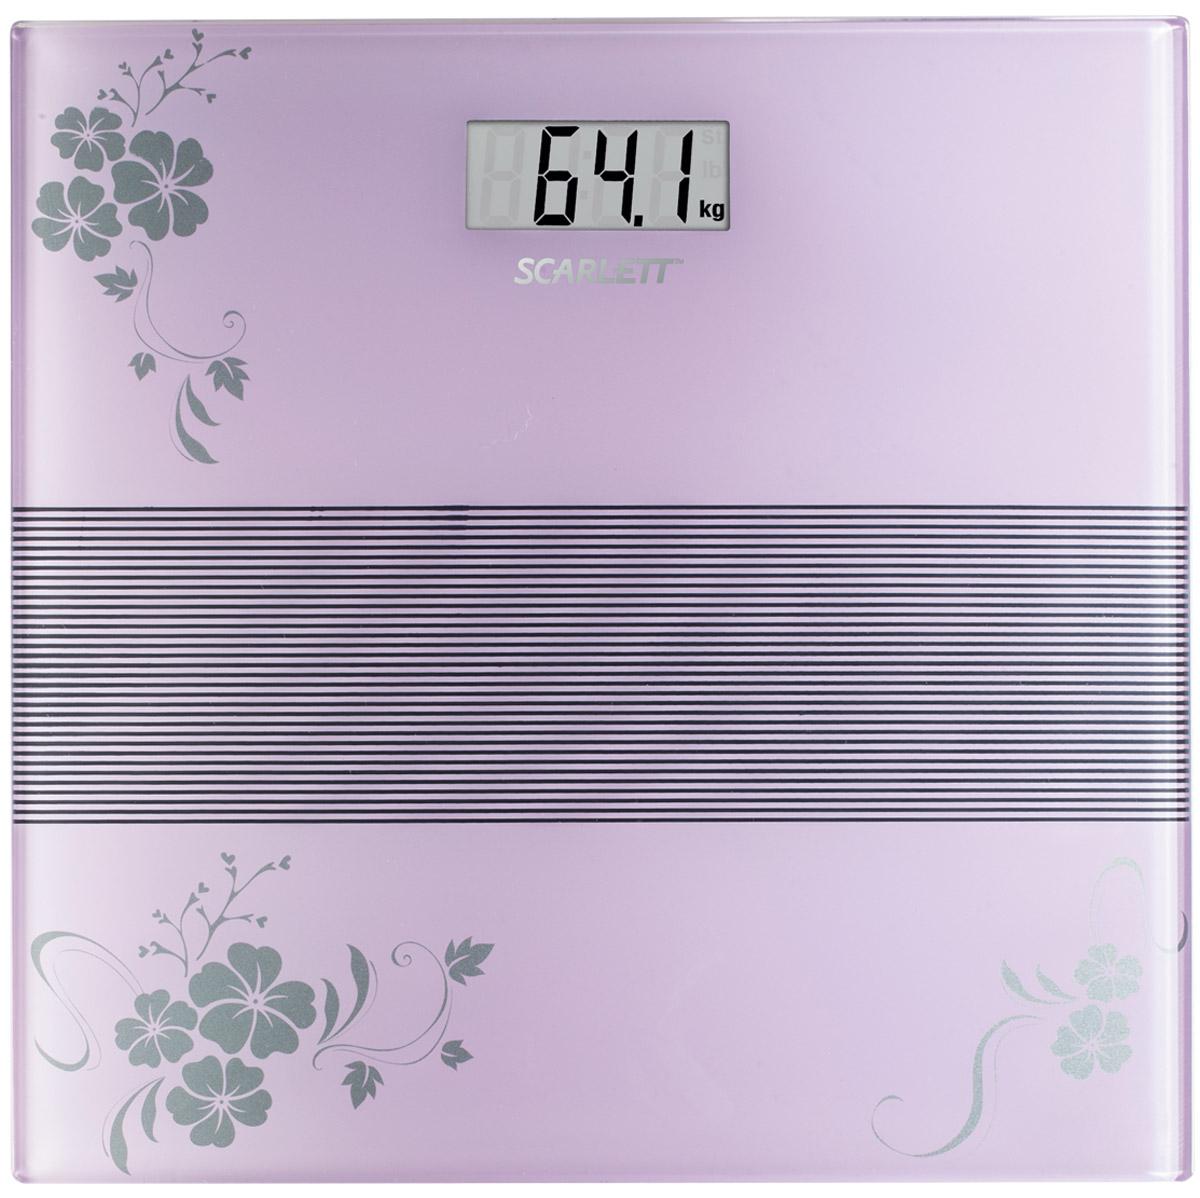 Scarlett SC-BS33E060, Violet весы напольные электронные какой фирмы напольные весы лучше купить